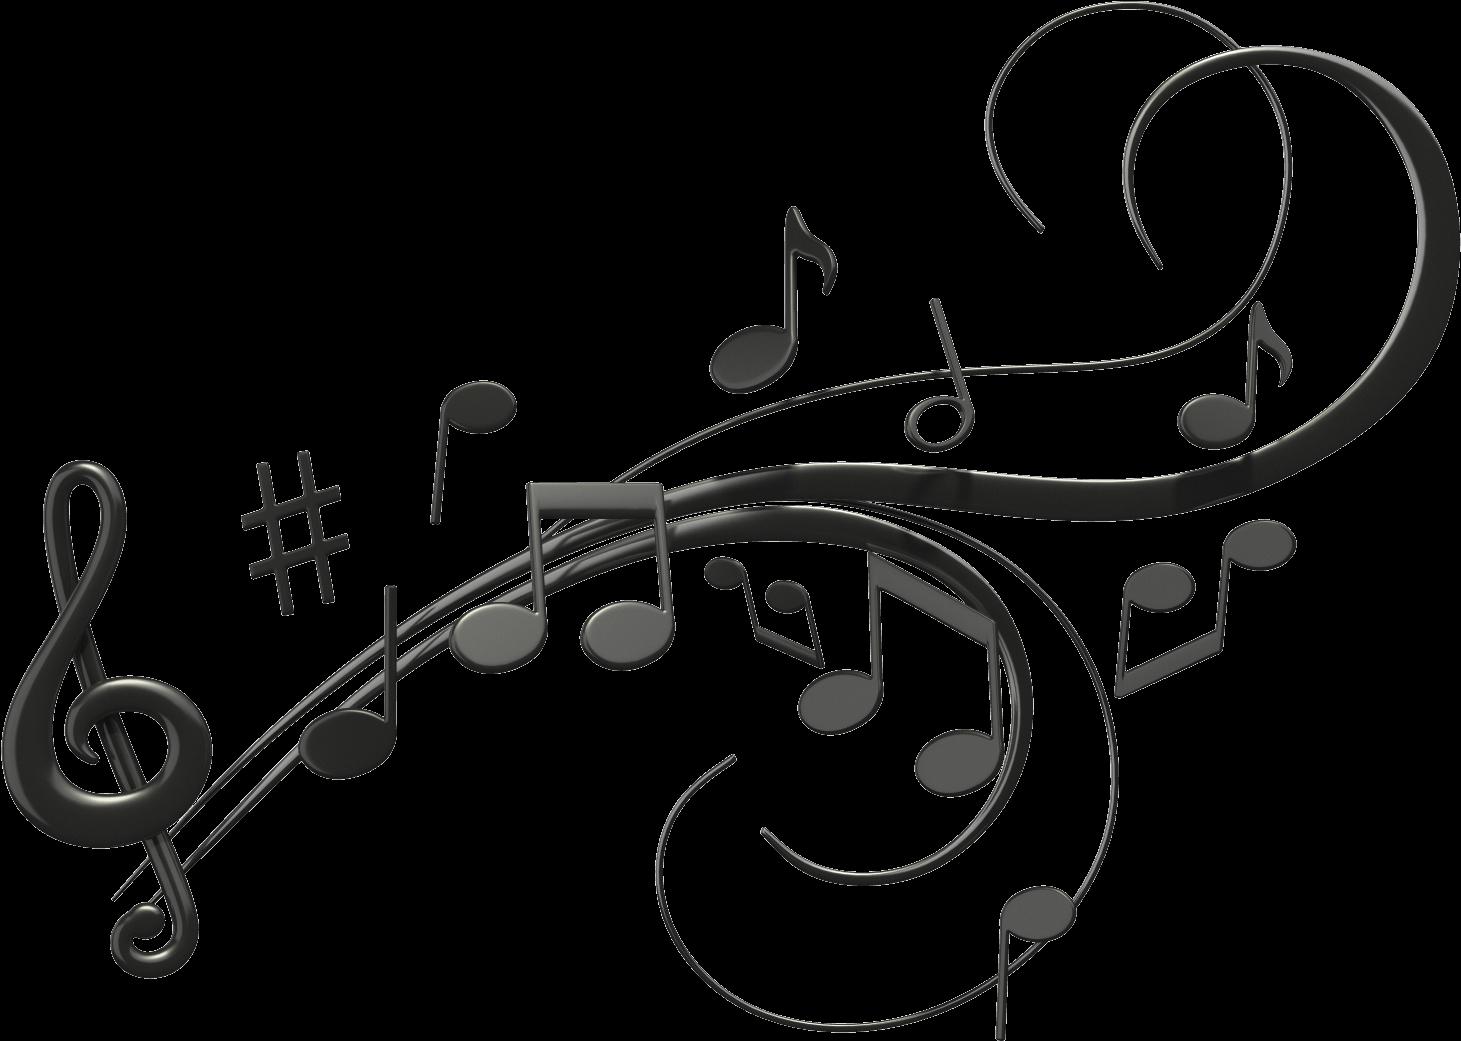 Music notes transparent background. Jazz clipart clip art